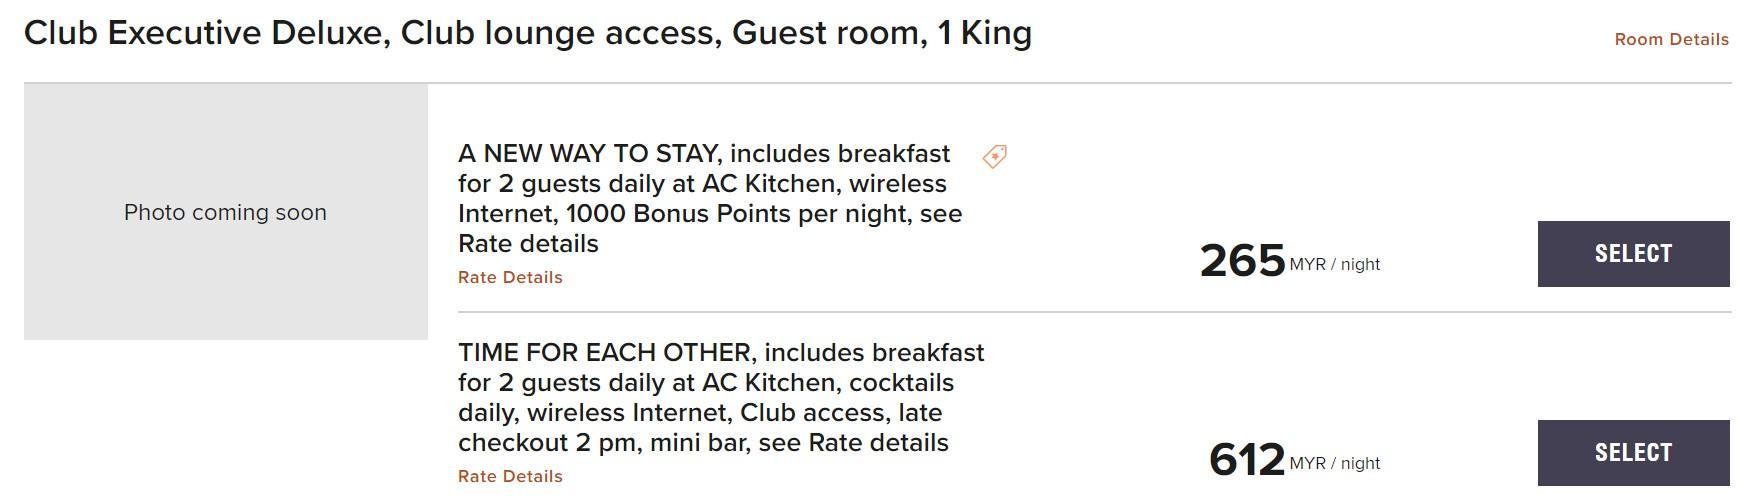 Опаньки: в одном отеле AC появился Club Lounge